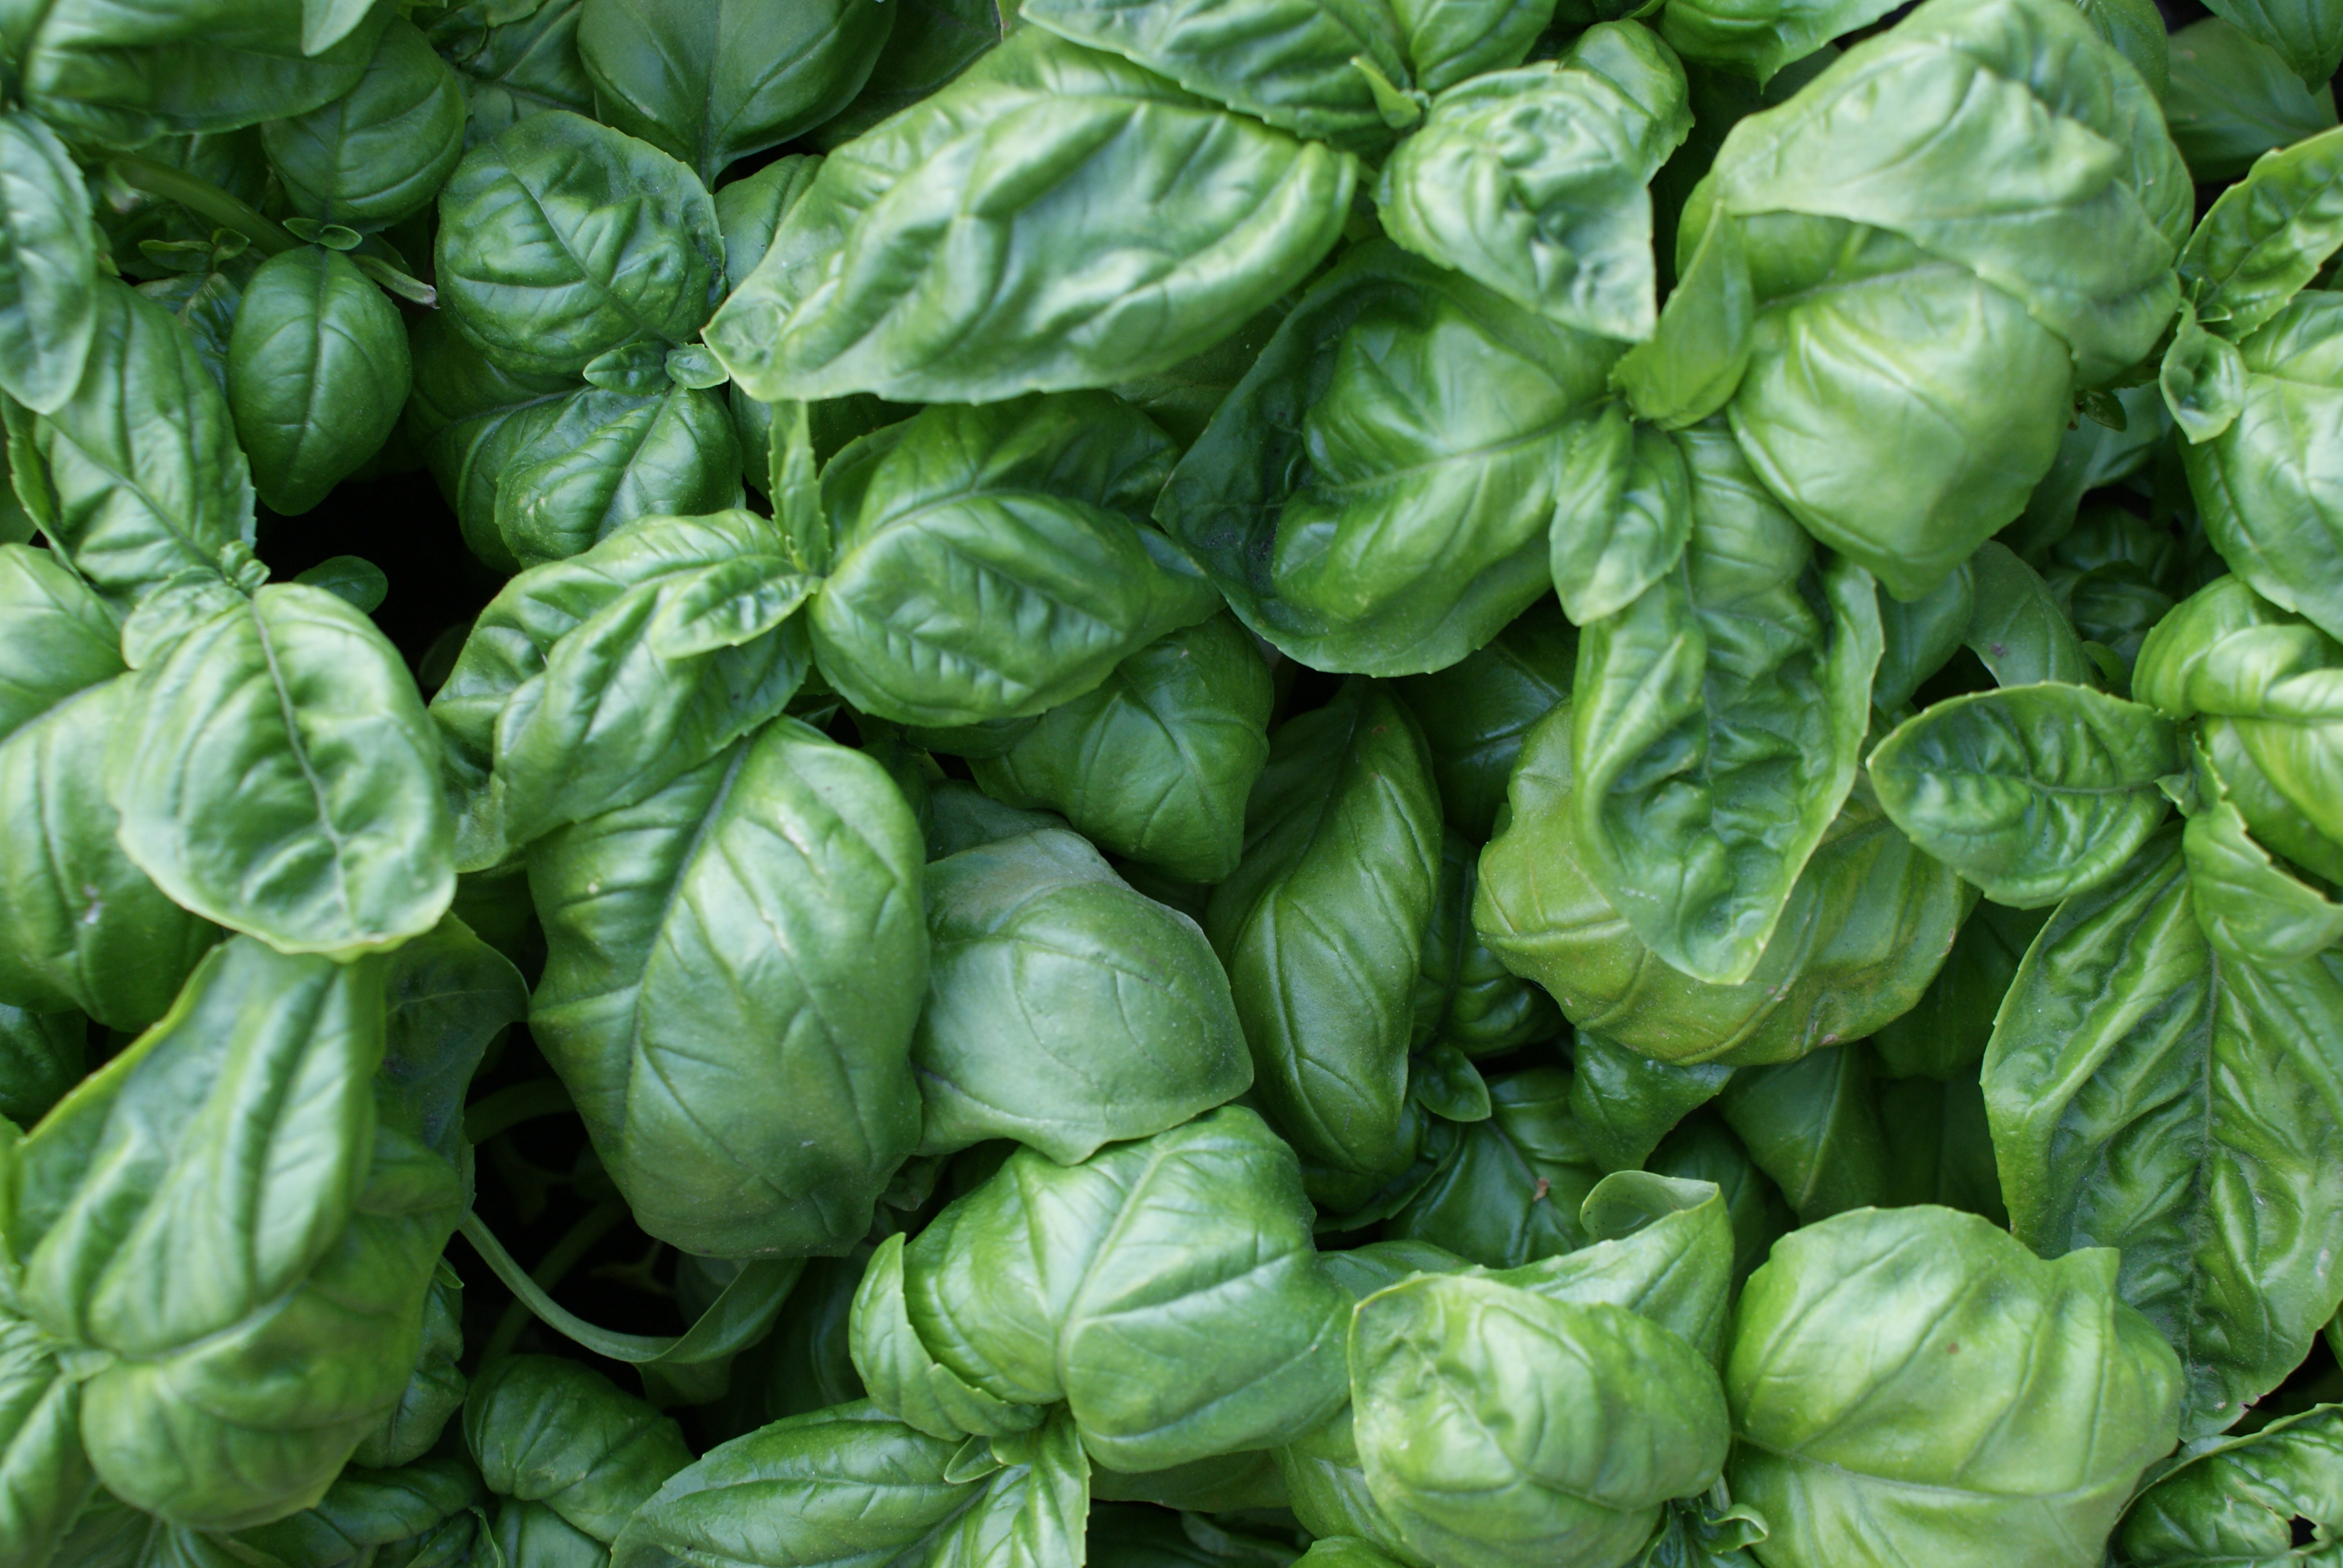 Les feuilles de basilic amies aromatiques de notre estomac